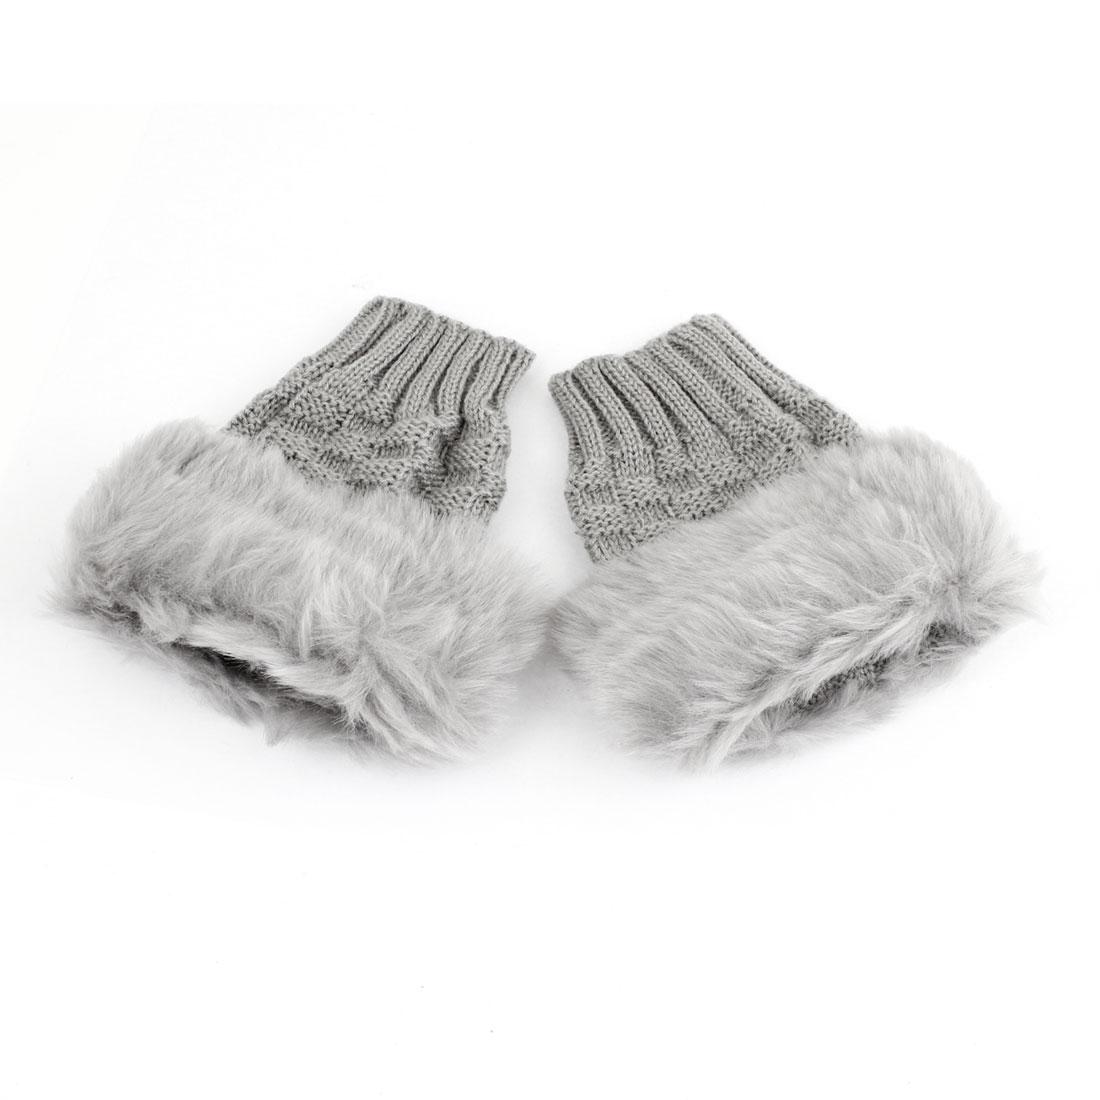 Lady Pair Faux Fur Thumbhole Light Gray Fingerless Short Gloves